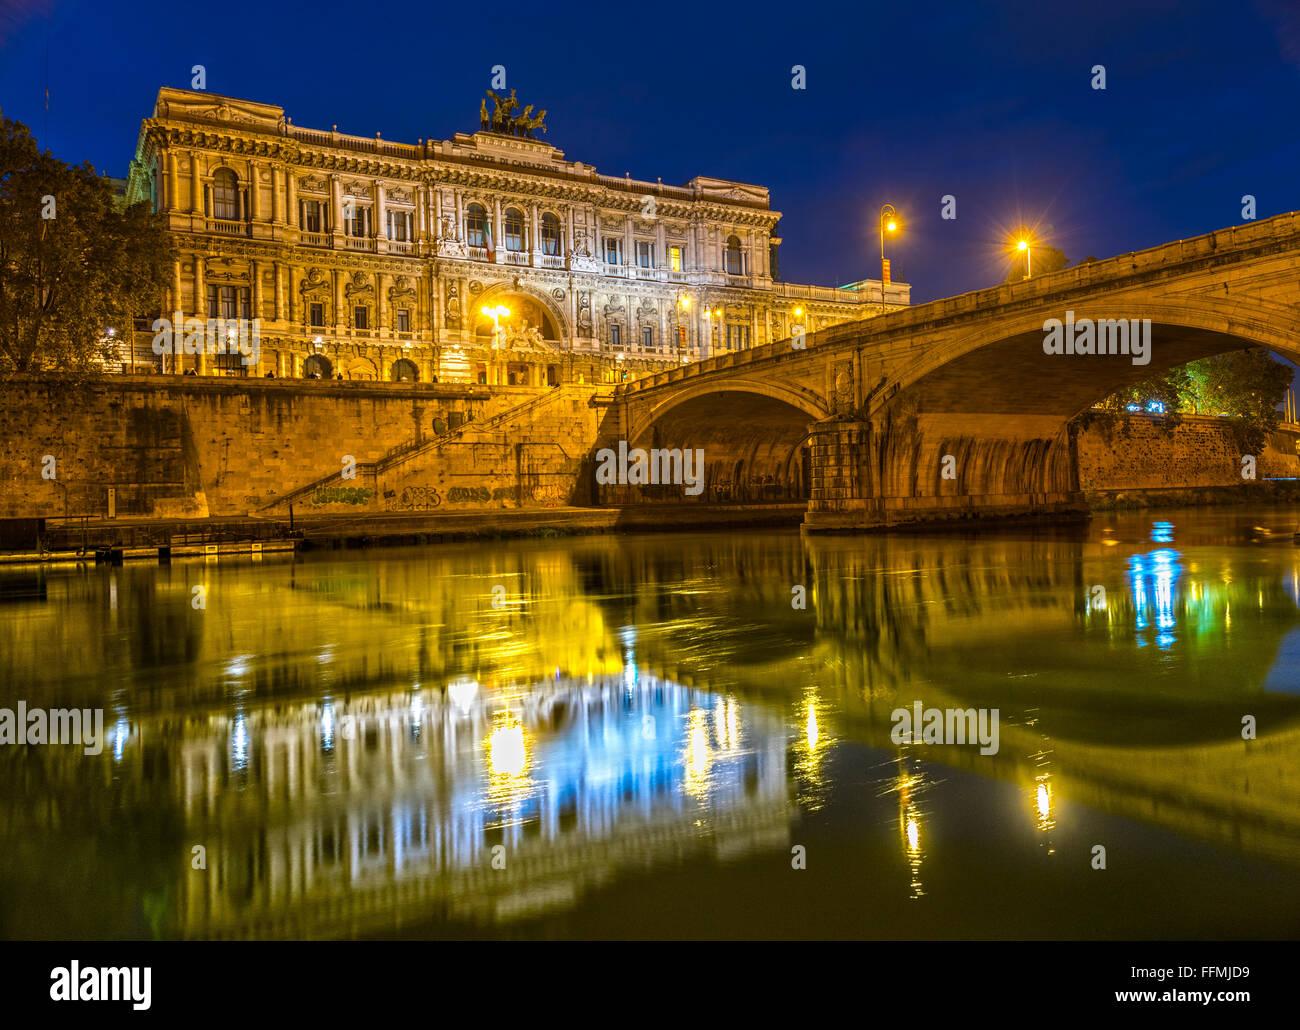 Rom, Justizpalast und Brücke Umberto I.Italy. Stockbild